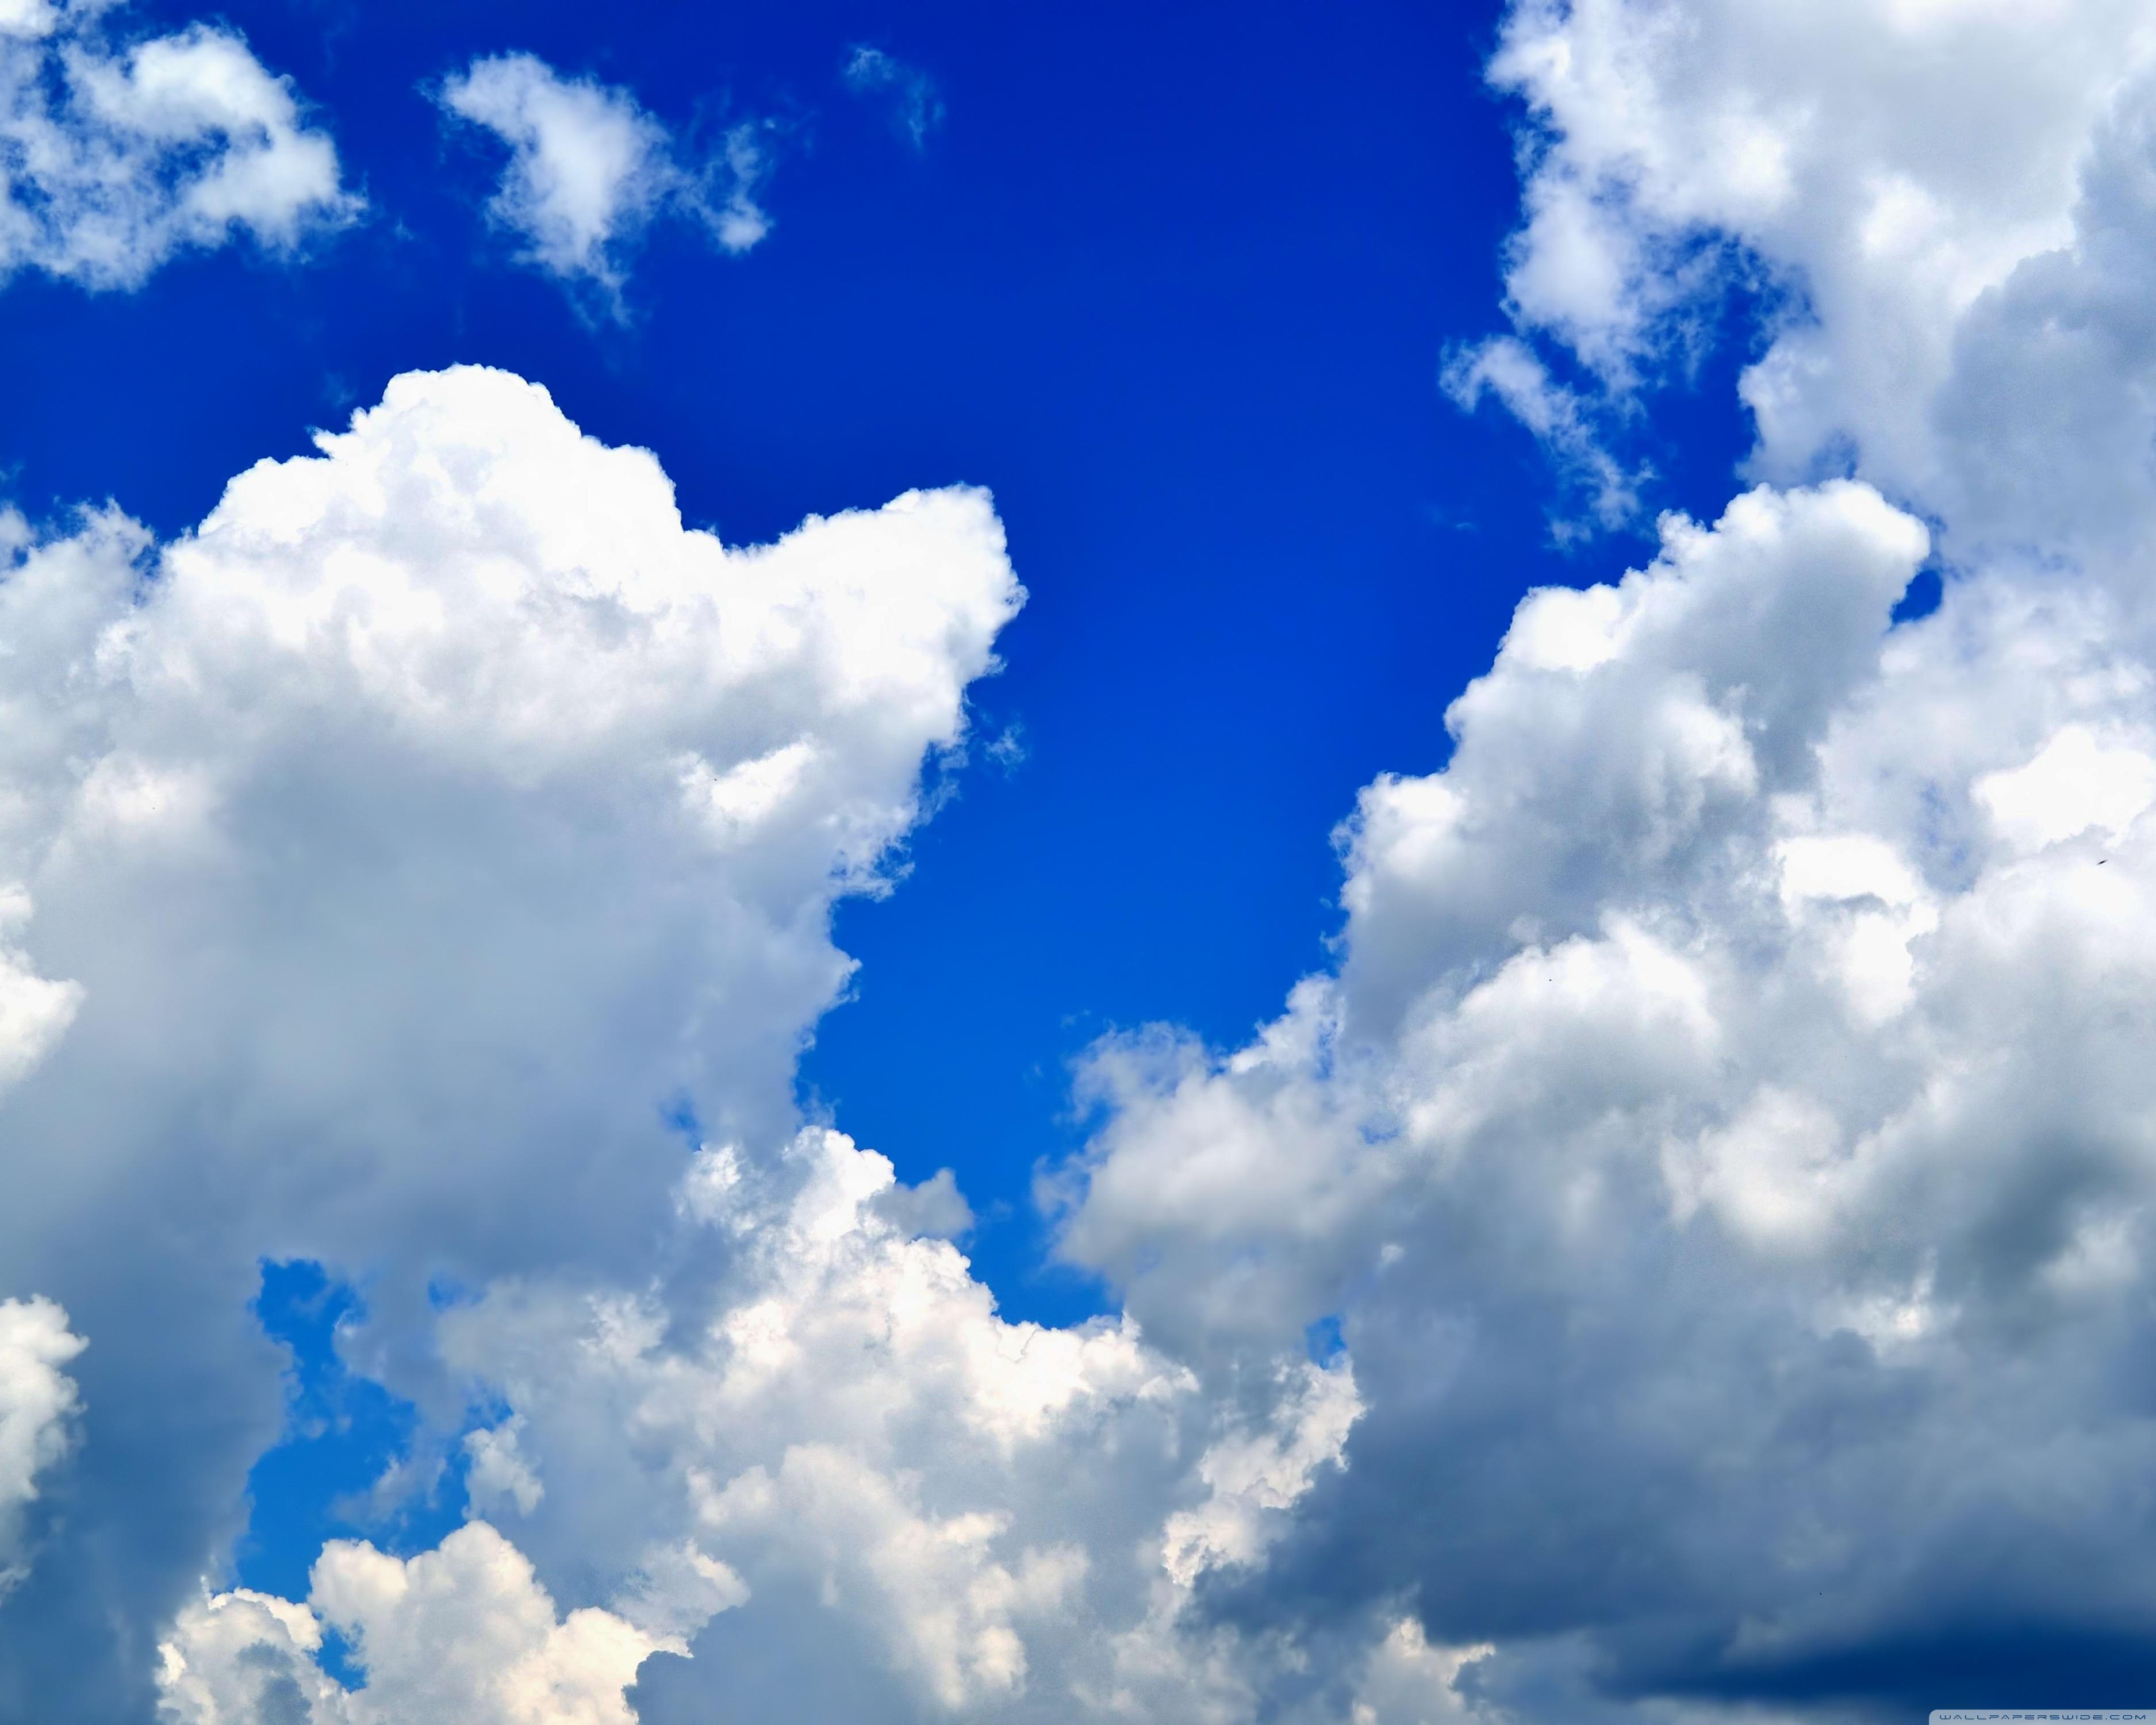 clouds wallpaper 3750x3000